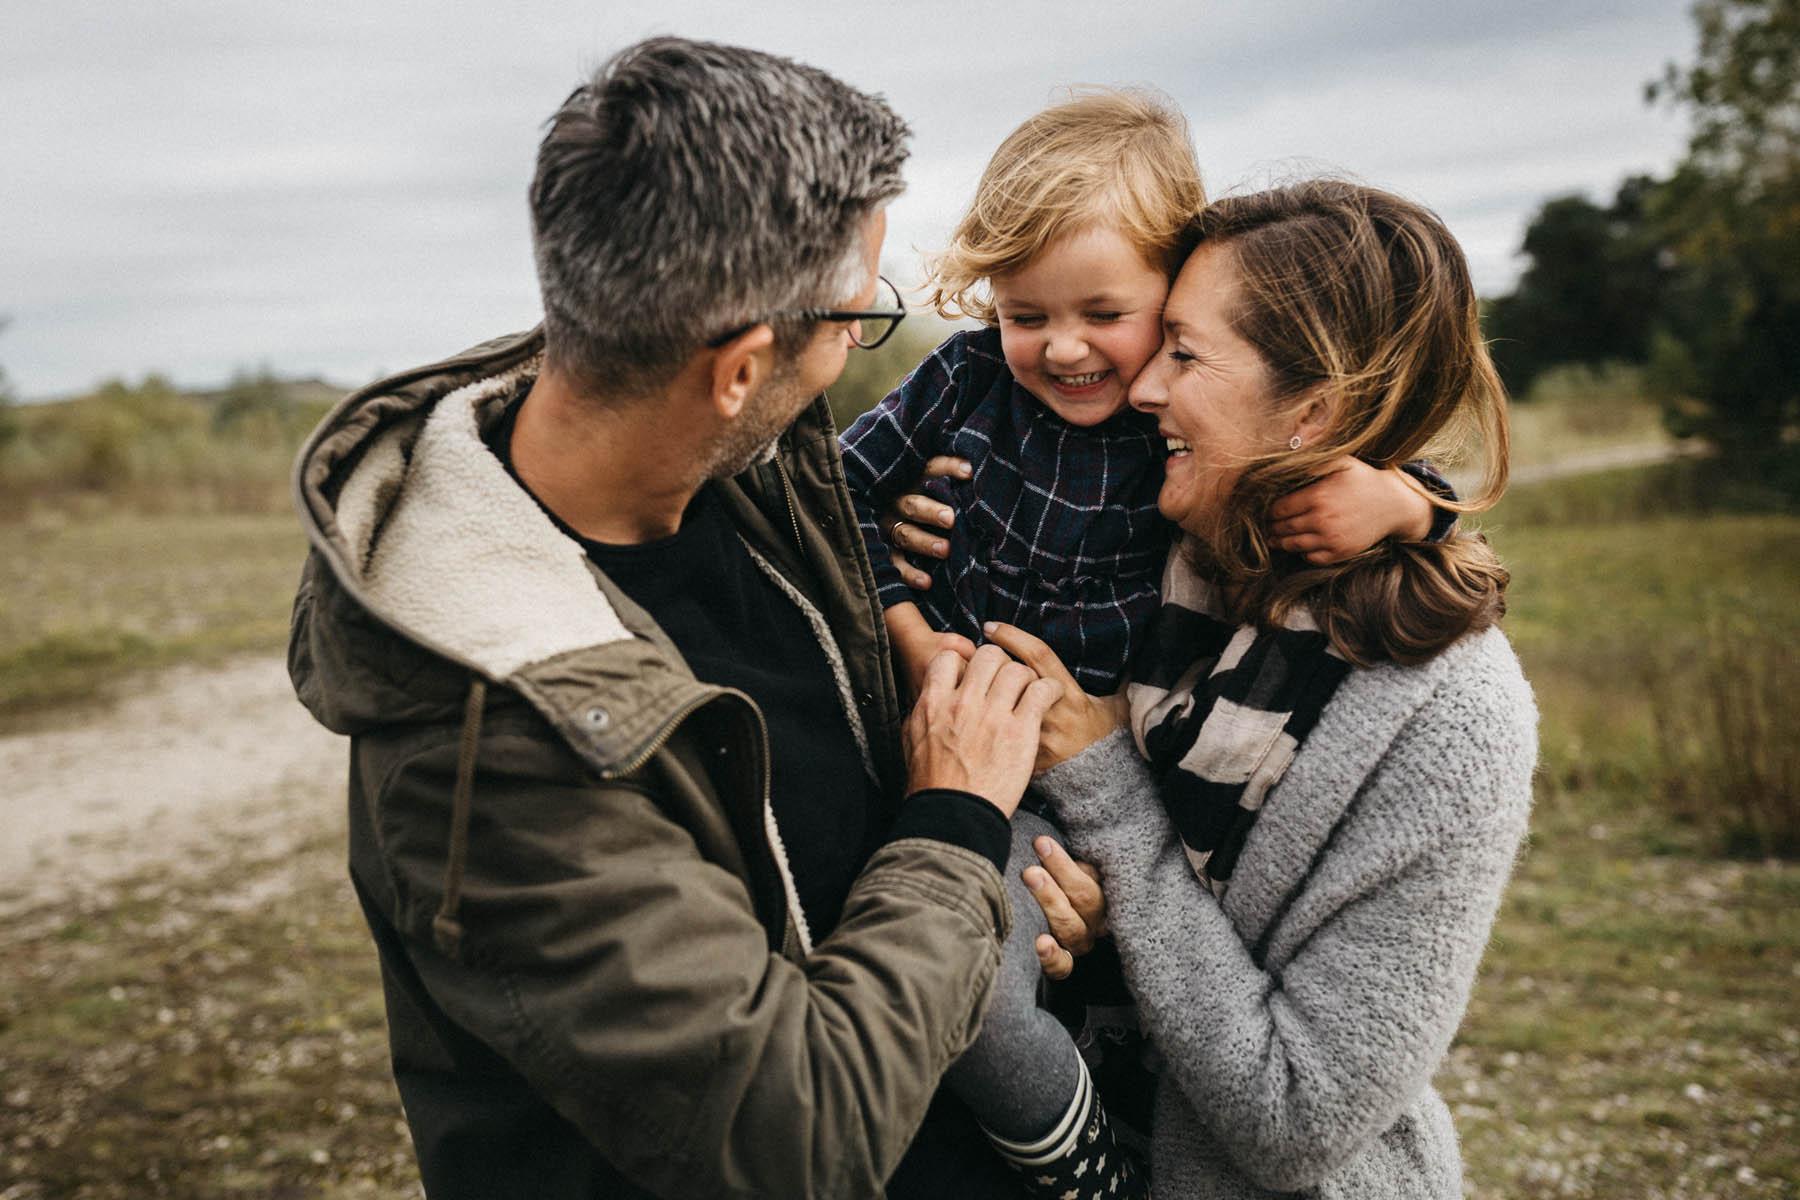 raissa simon fotografie familienfotos froettmaninger heide 041 - Annabel, Steffen + Cleo